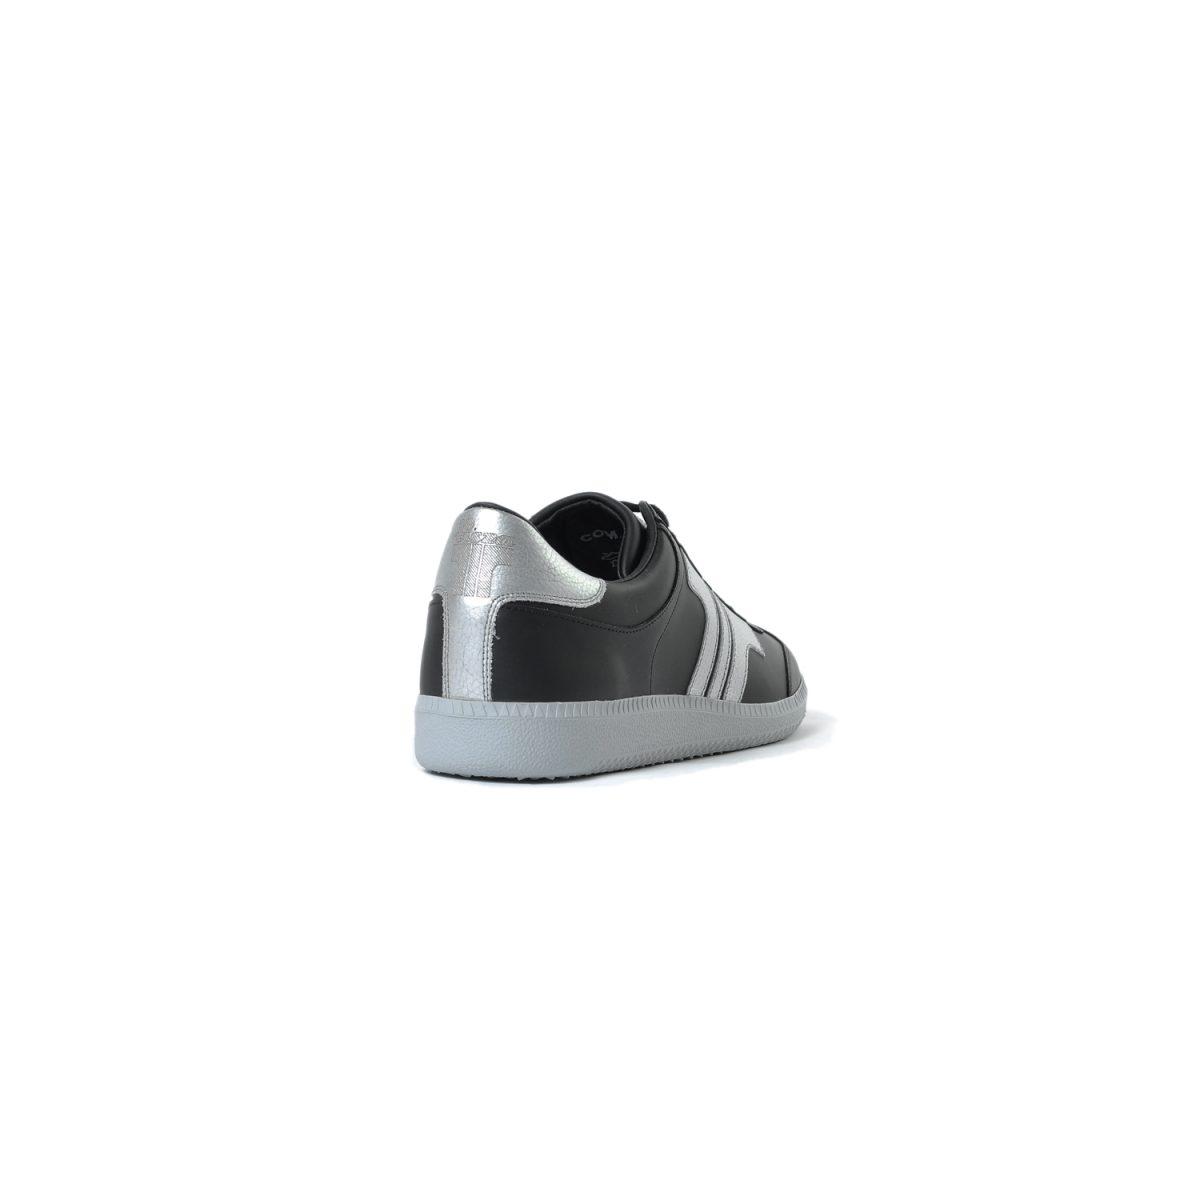 Tisza shoes - Compakt - Black-silver